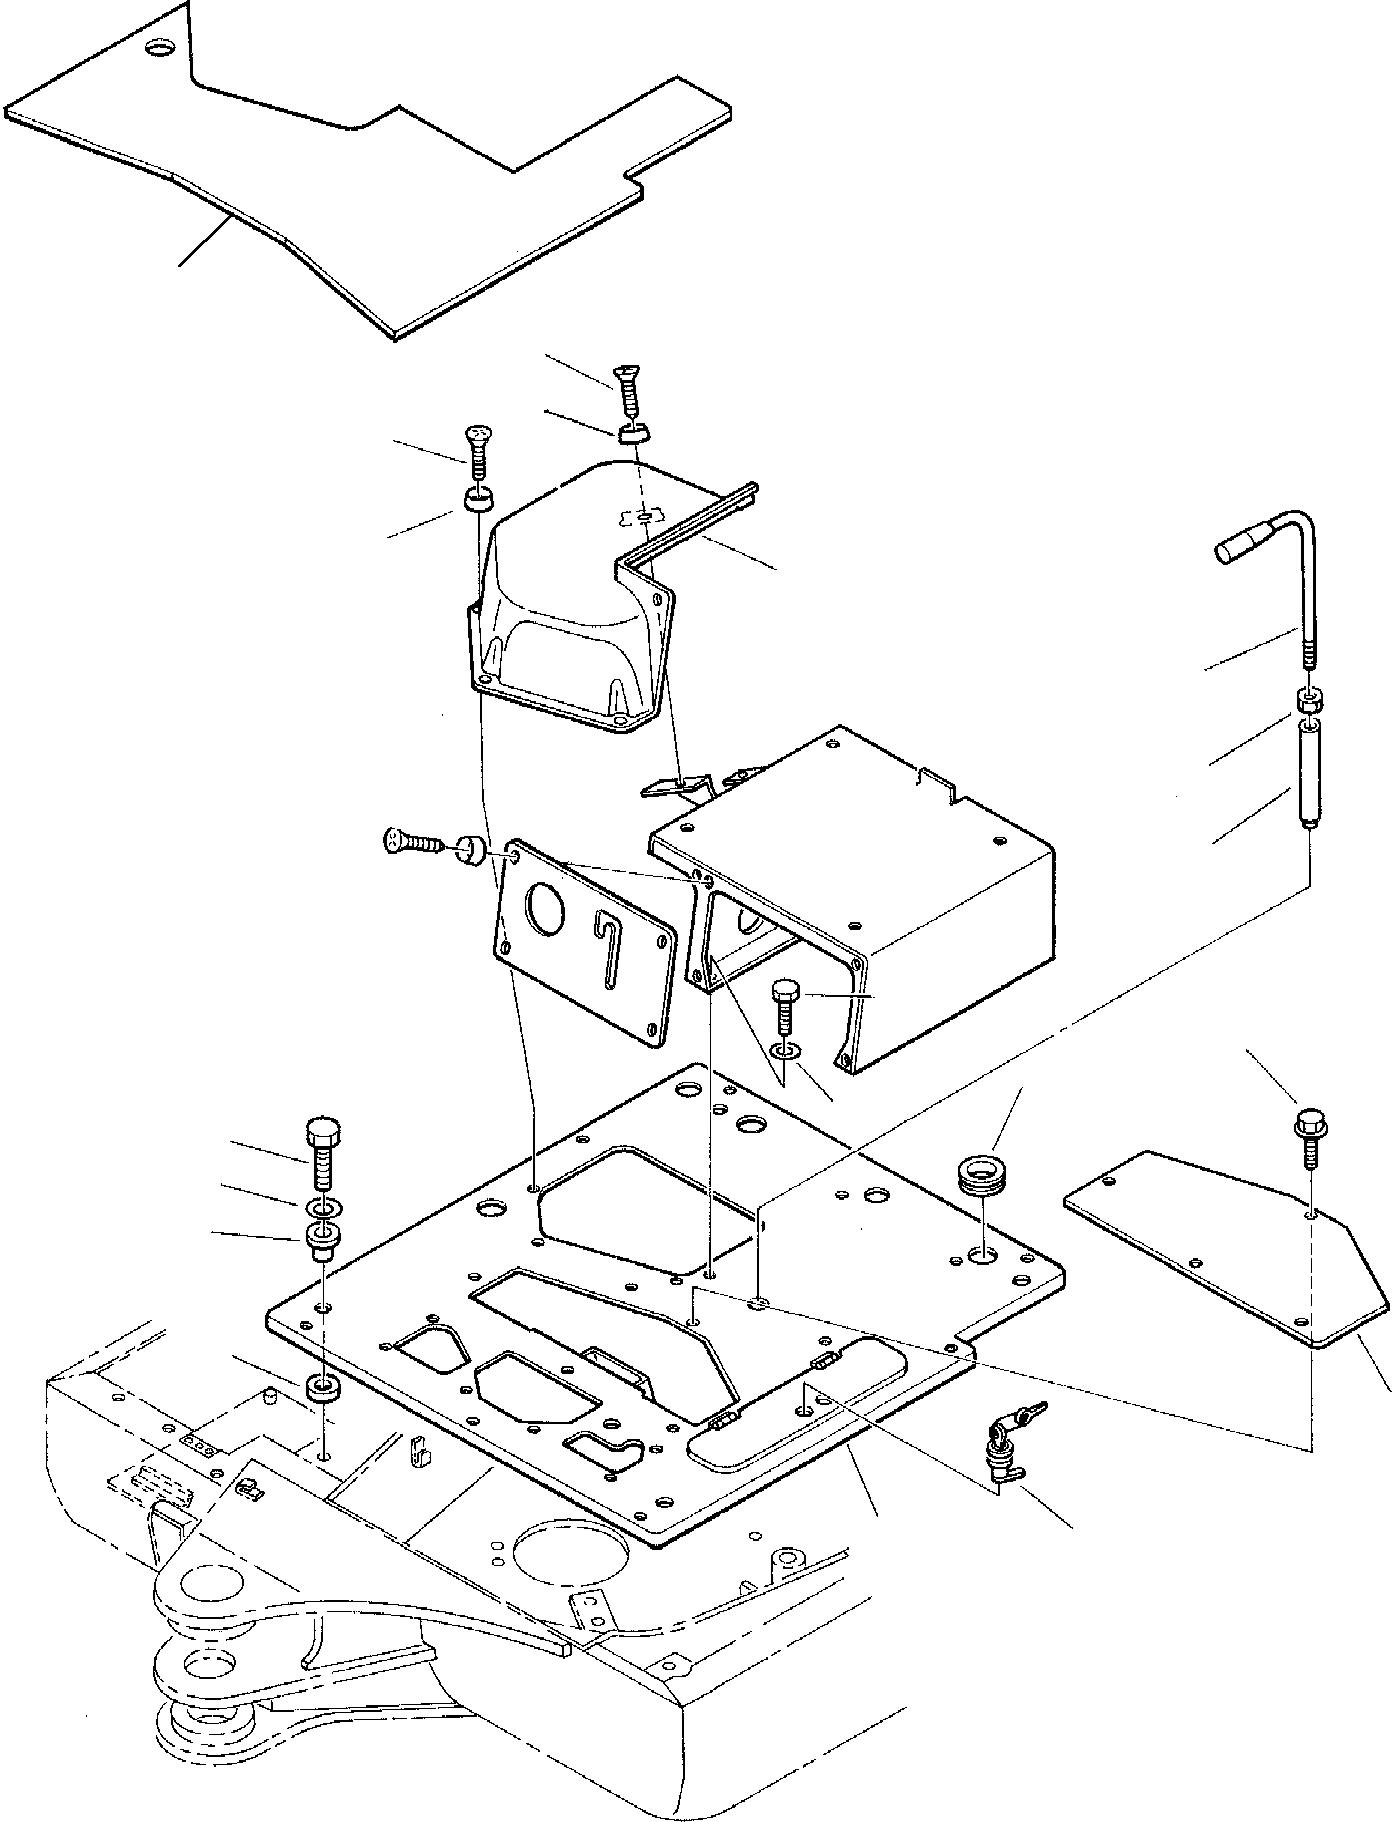 3F1050050 Komatsu OPERATOR